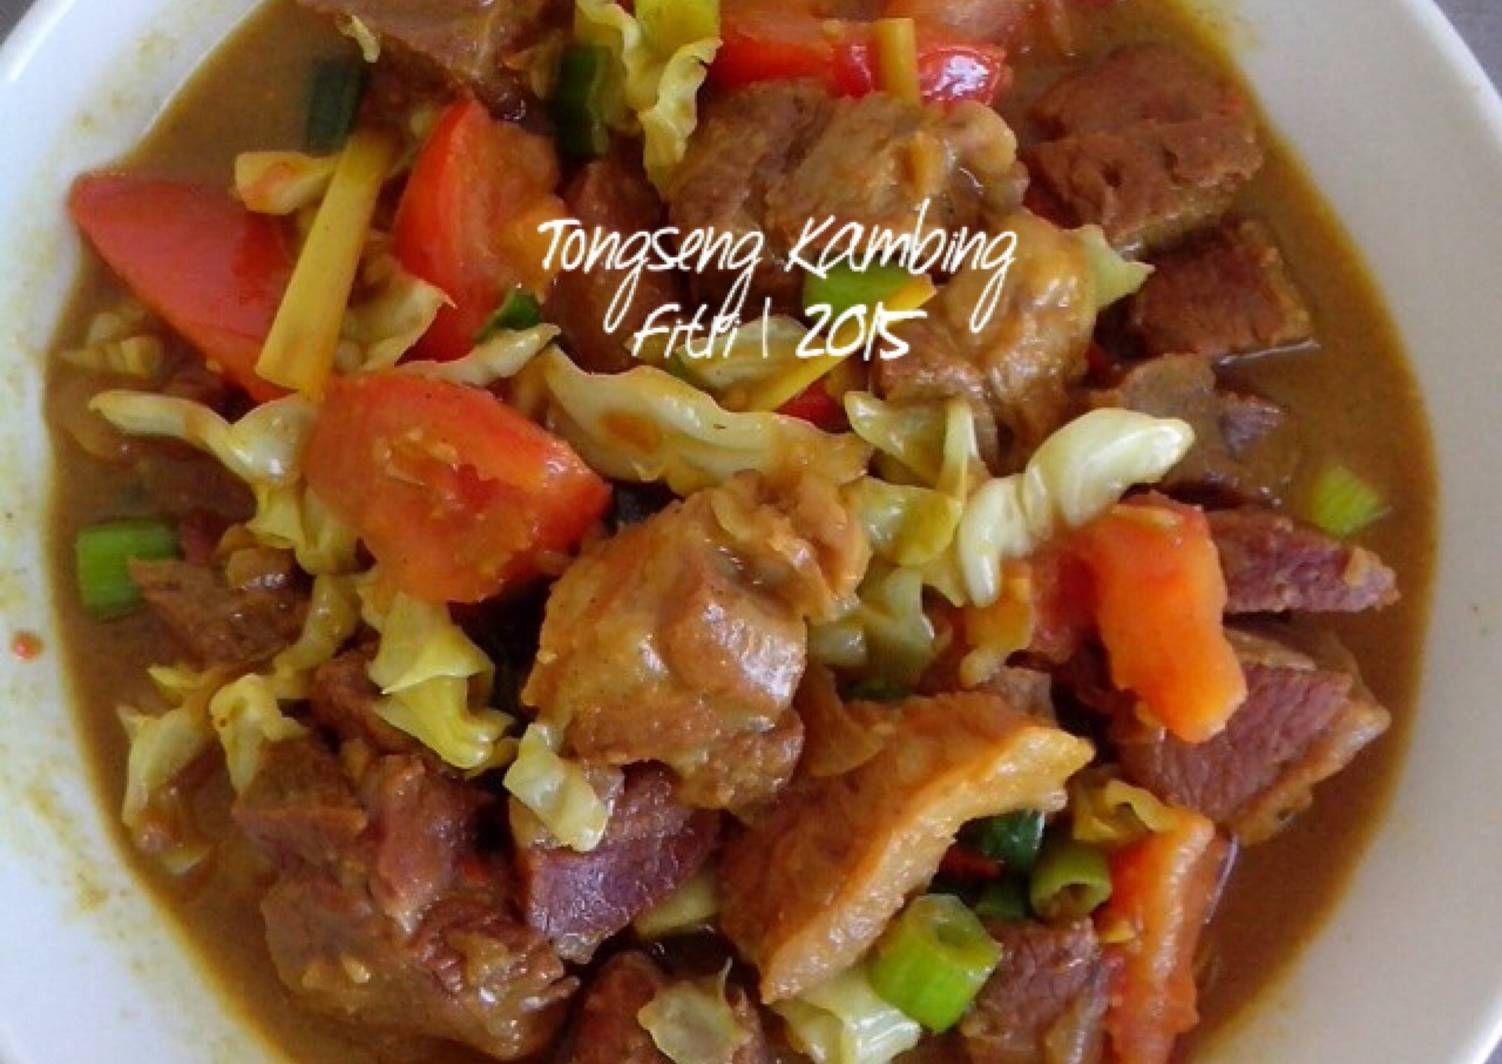 Resep Tongseng Kambing Cokies Recipes Food Food Recipies